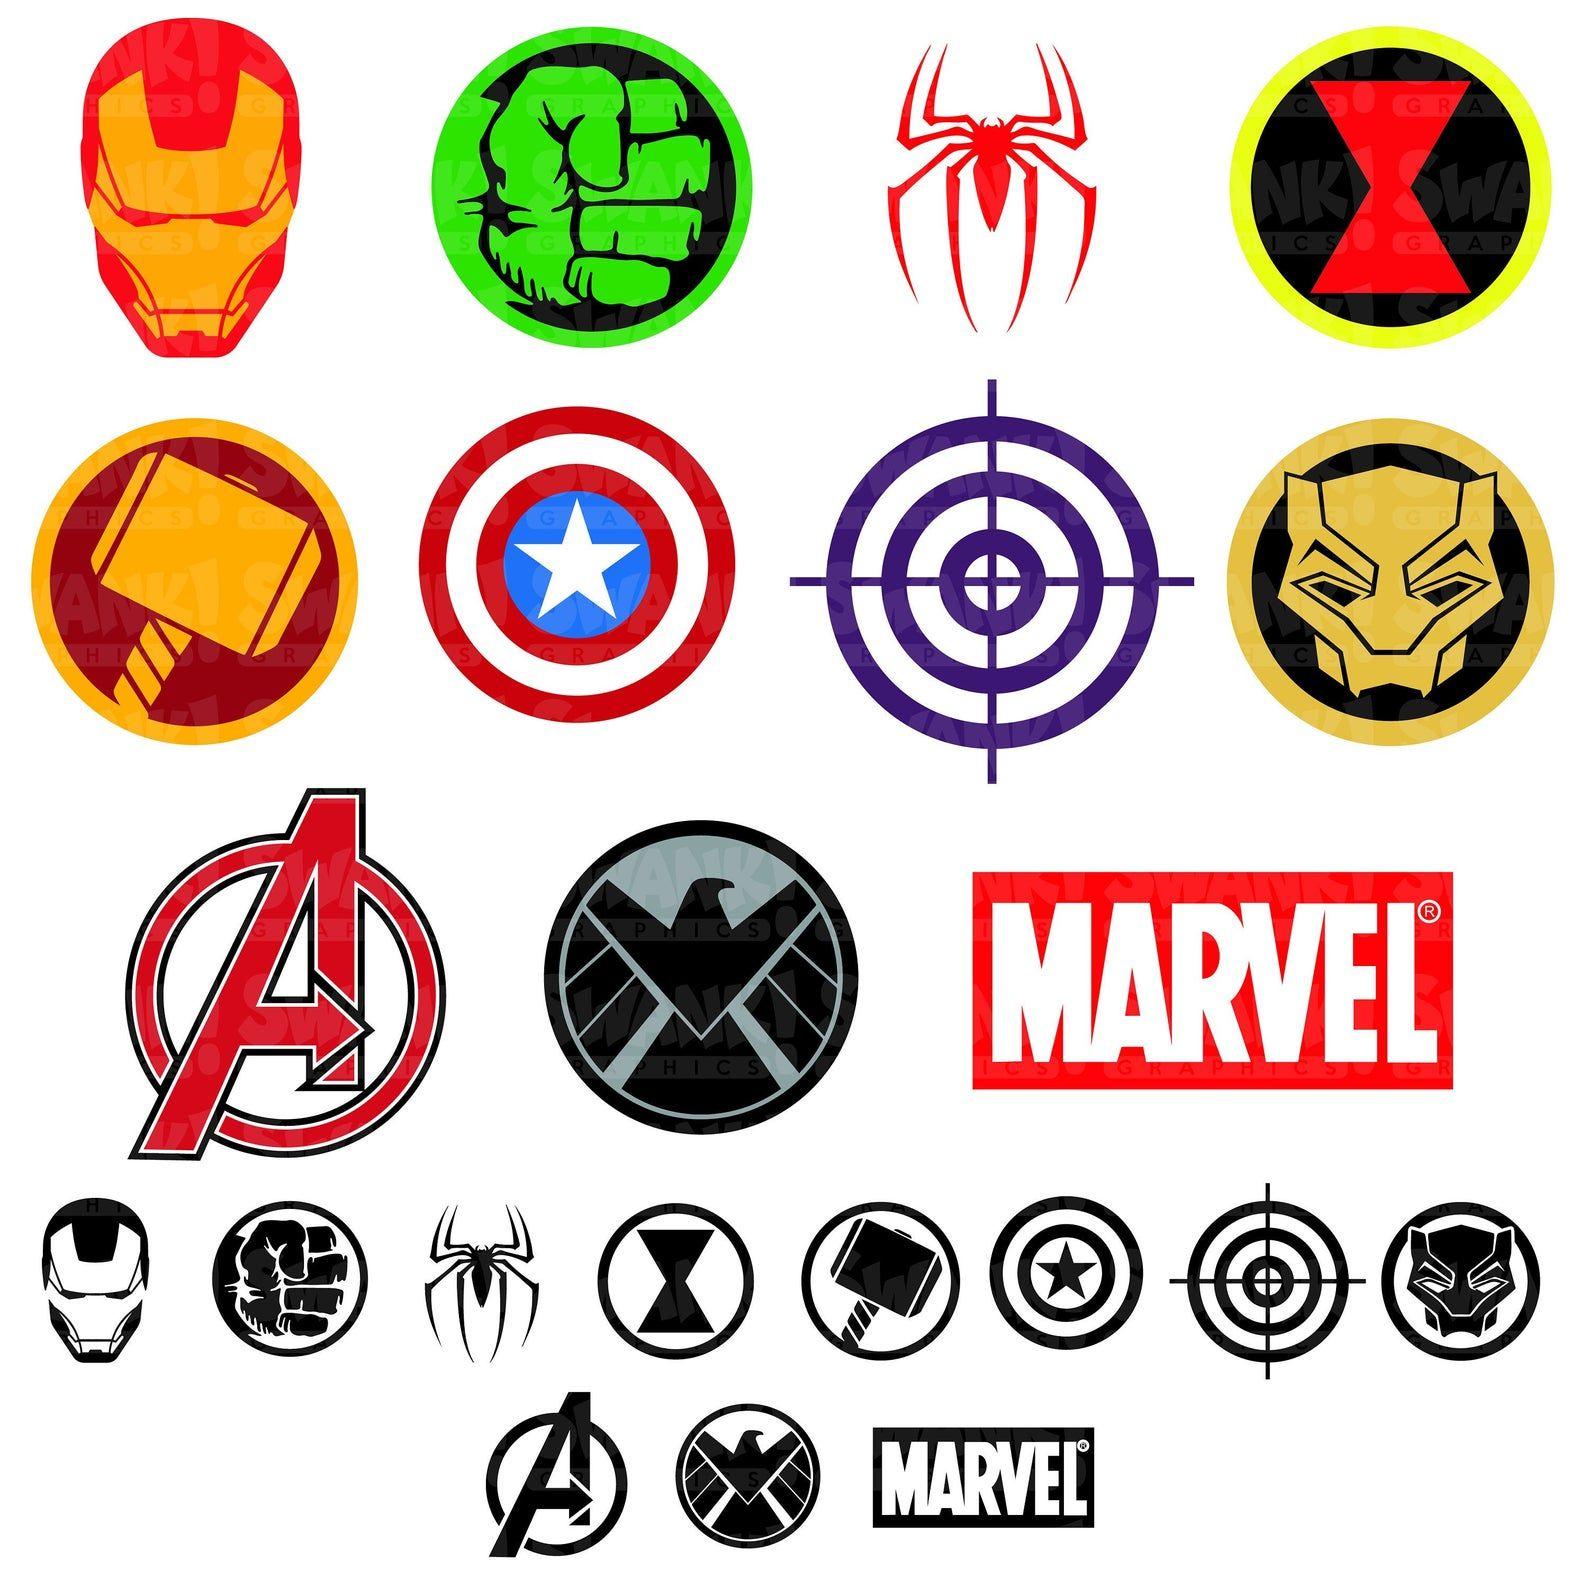 Avengers Superhero Symbol Clipart SVG/PNG/EPS Iron Man